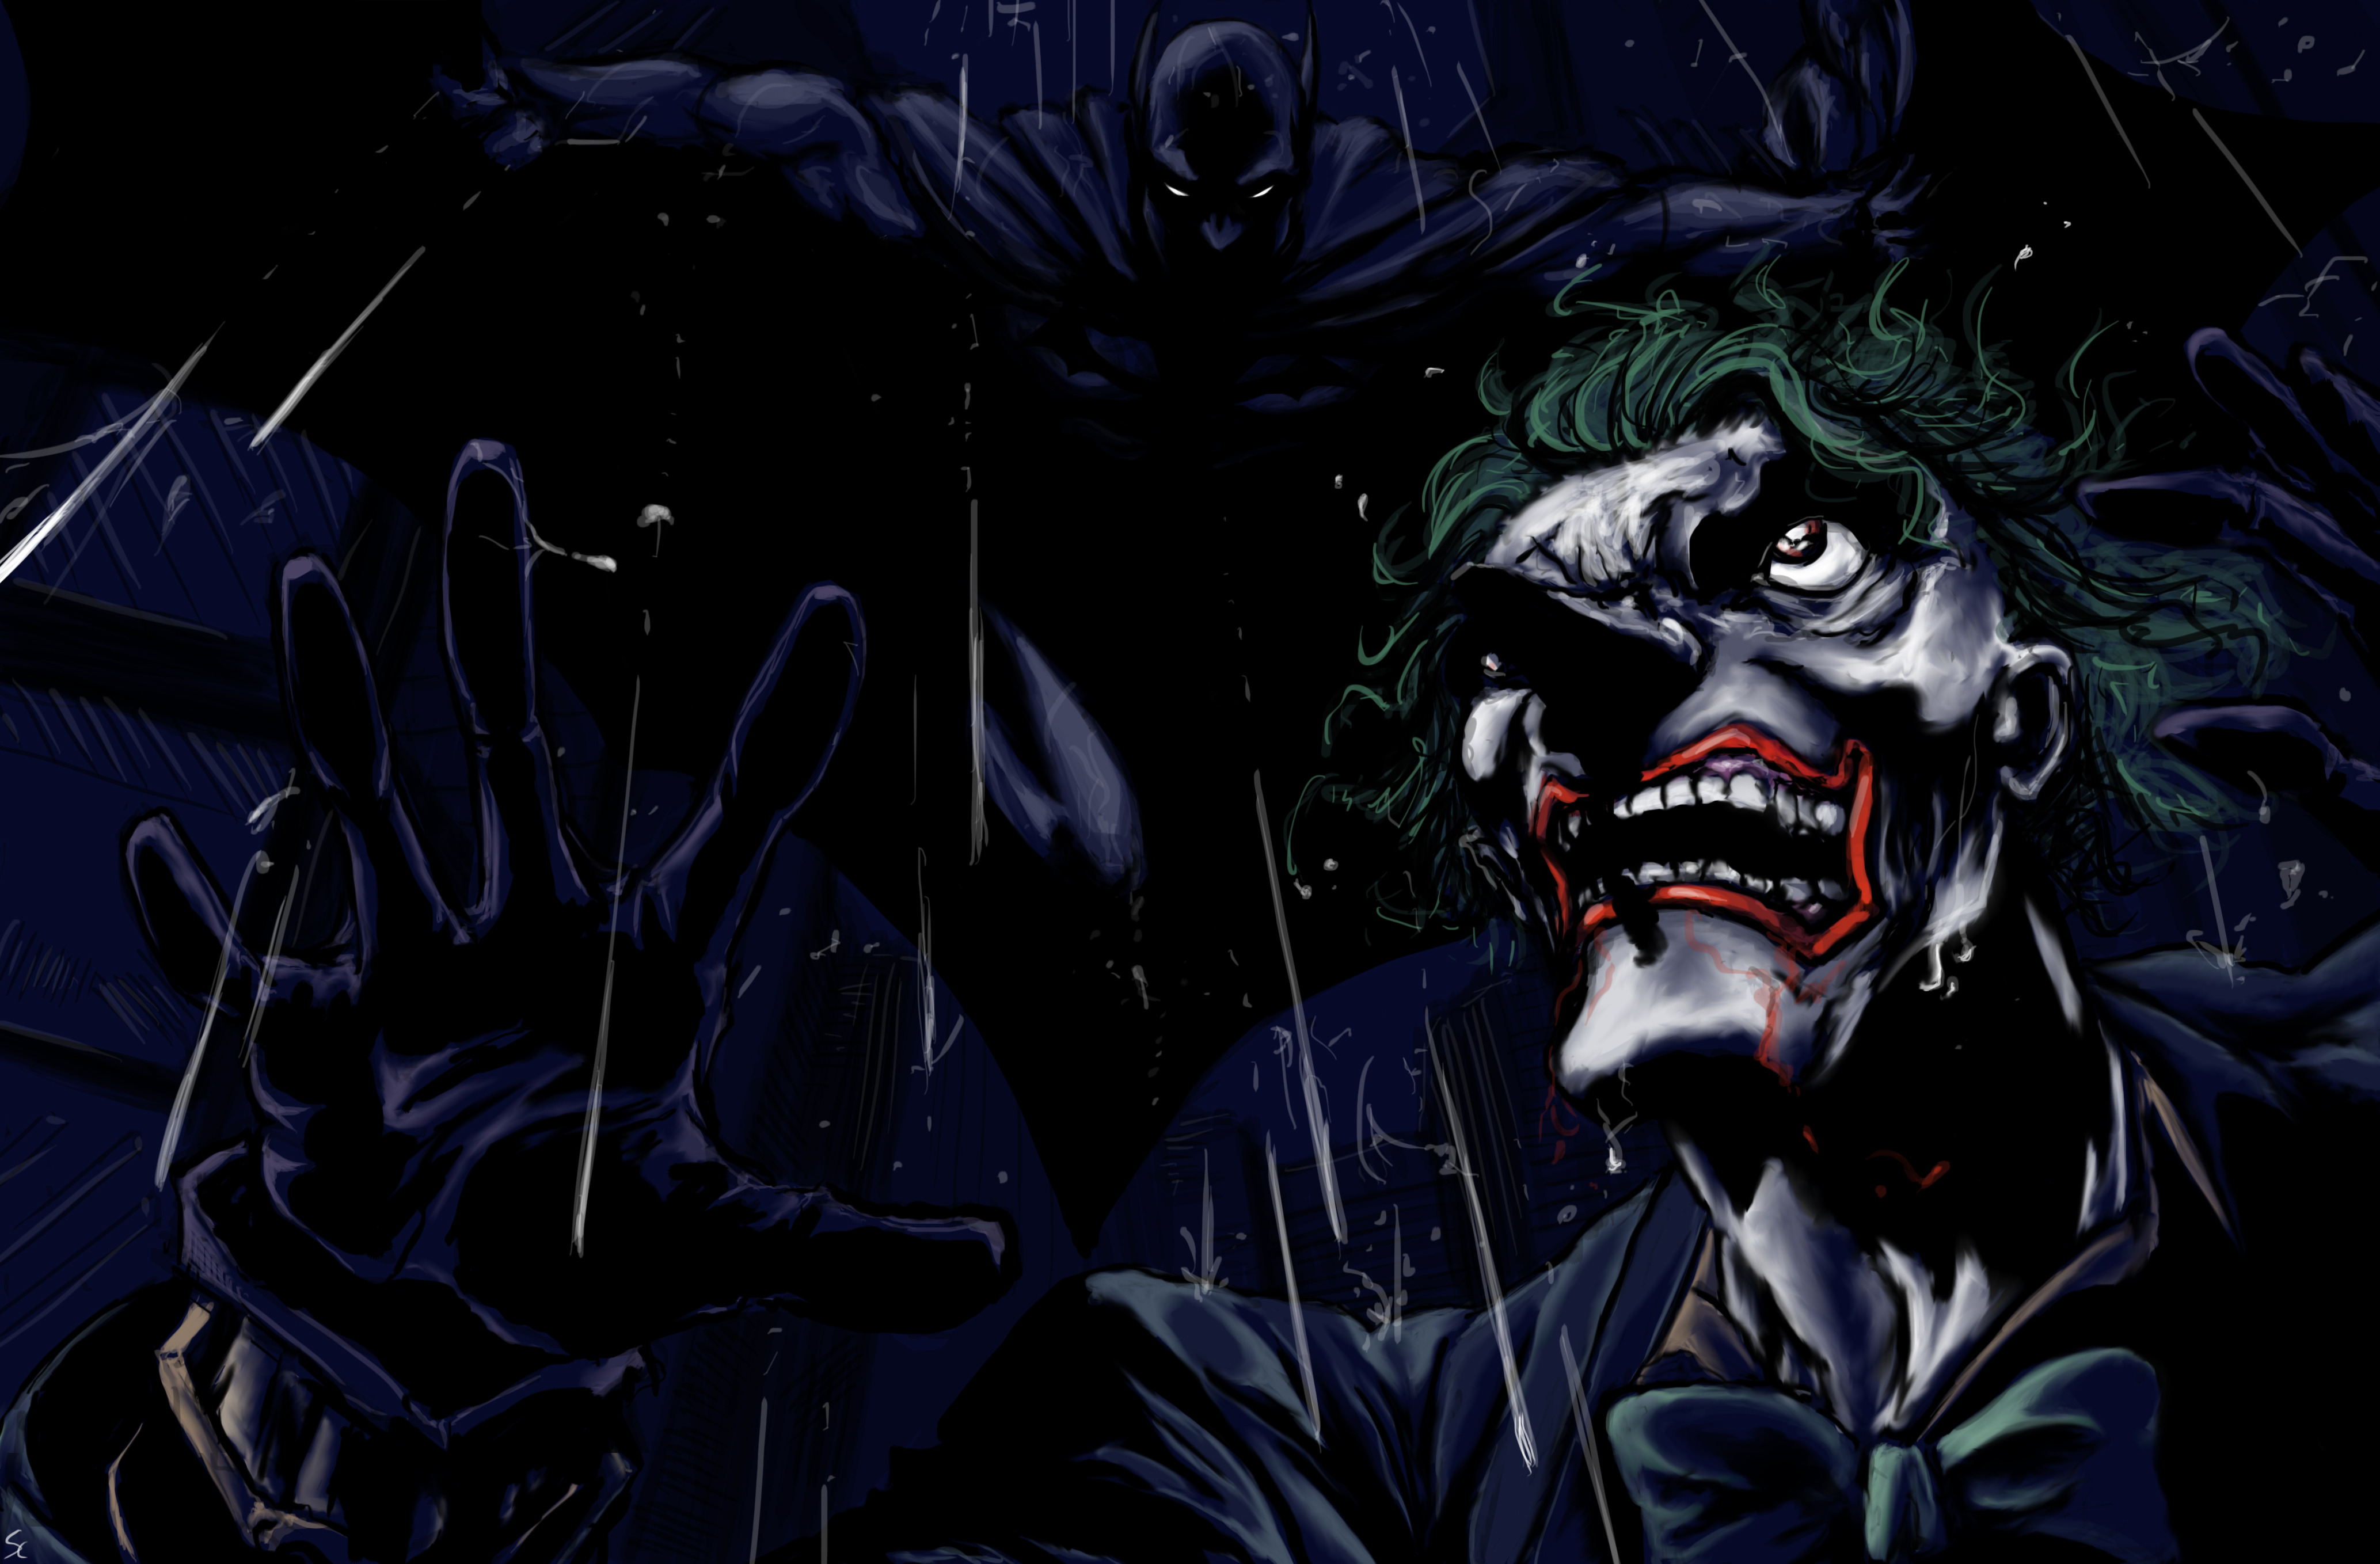 Batman 4k ultra hd wallpaper and background image for Joker wallpaper 4k